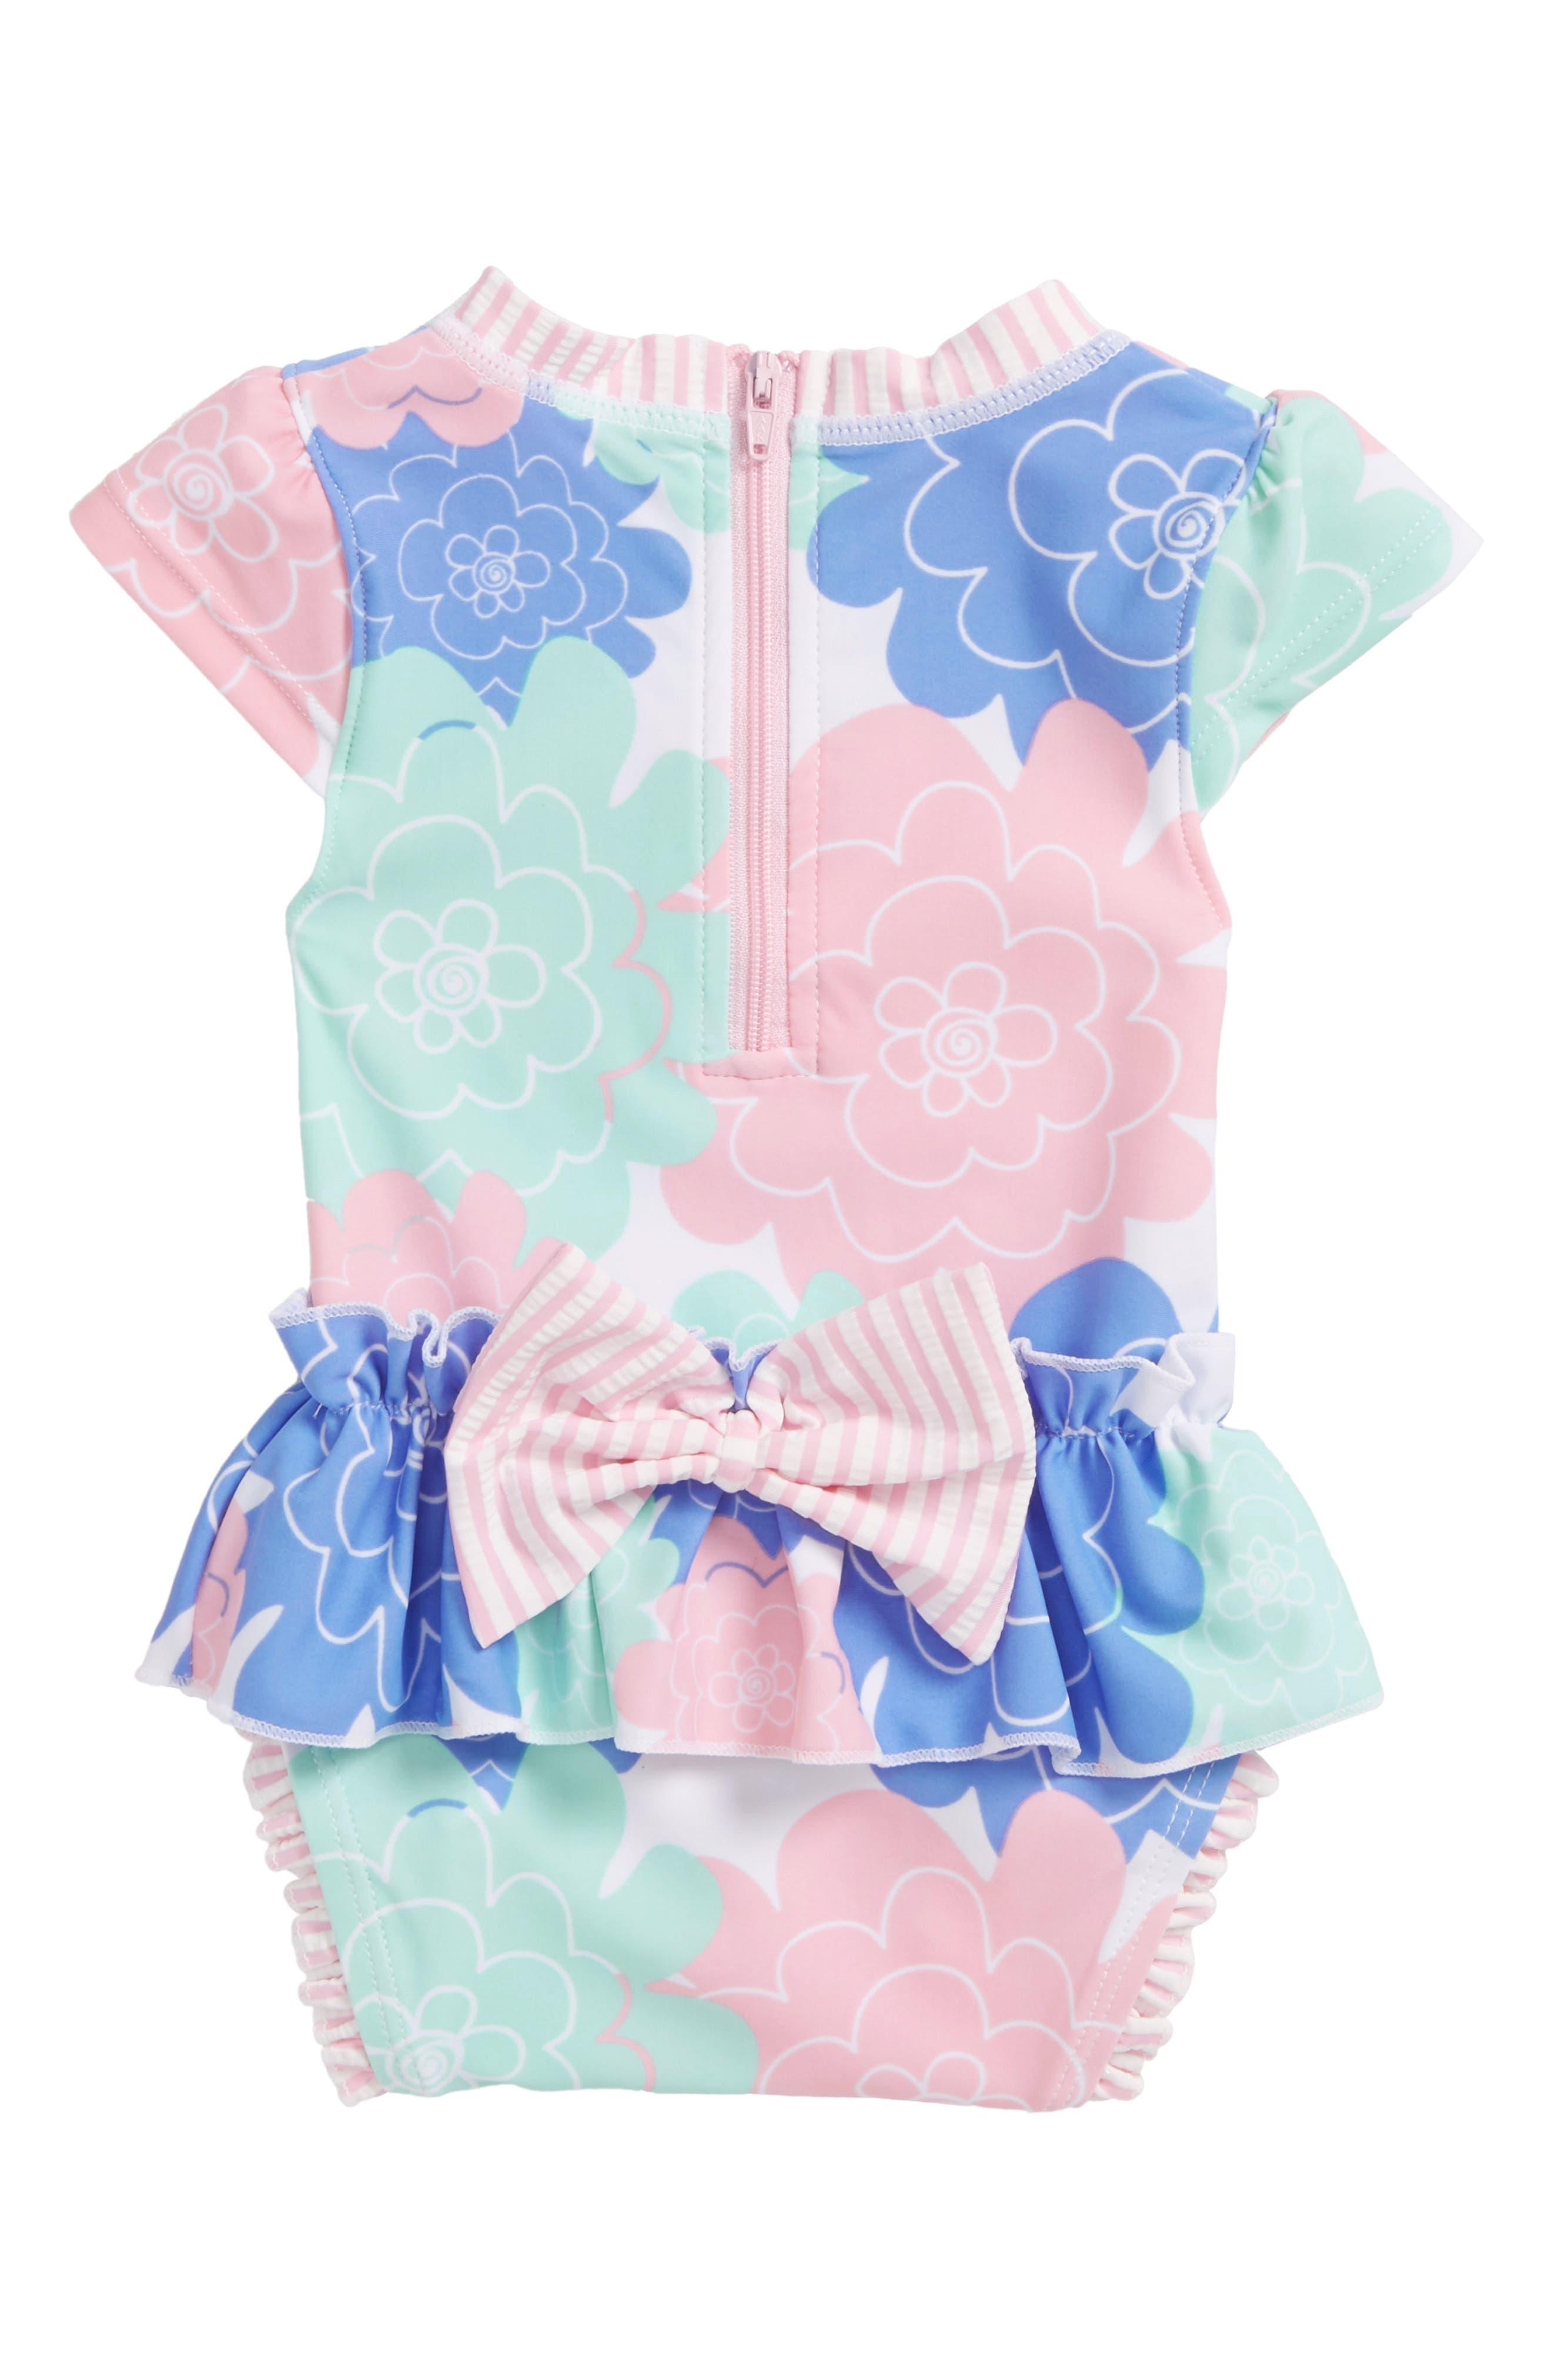 RUFFLEBUTTS,                             Pastel Petals Peplum One-Piece Swimsuit,                             Alternate thumbnail 2, color,                             180